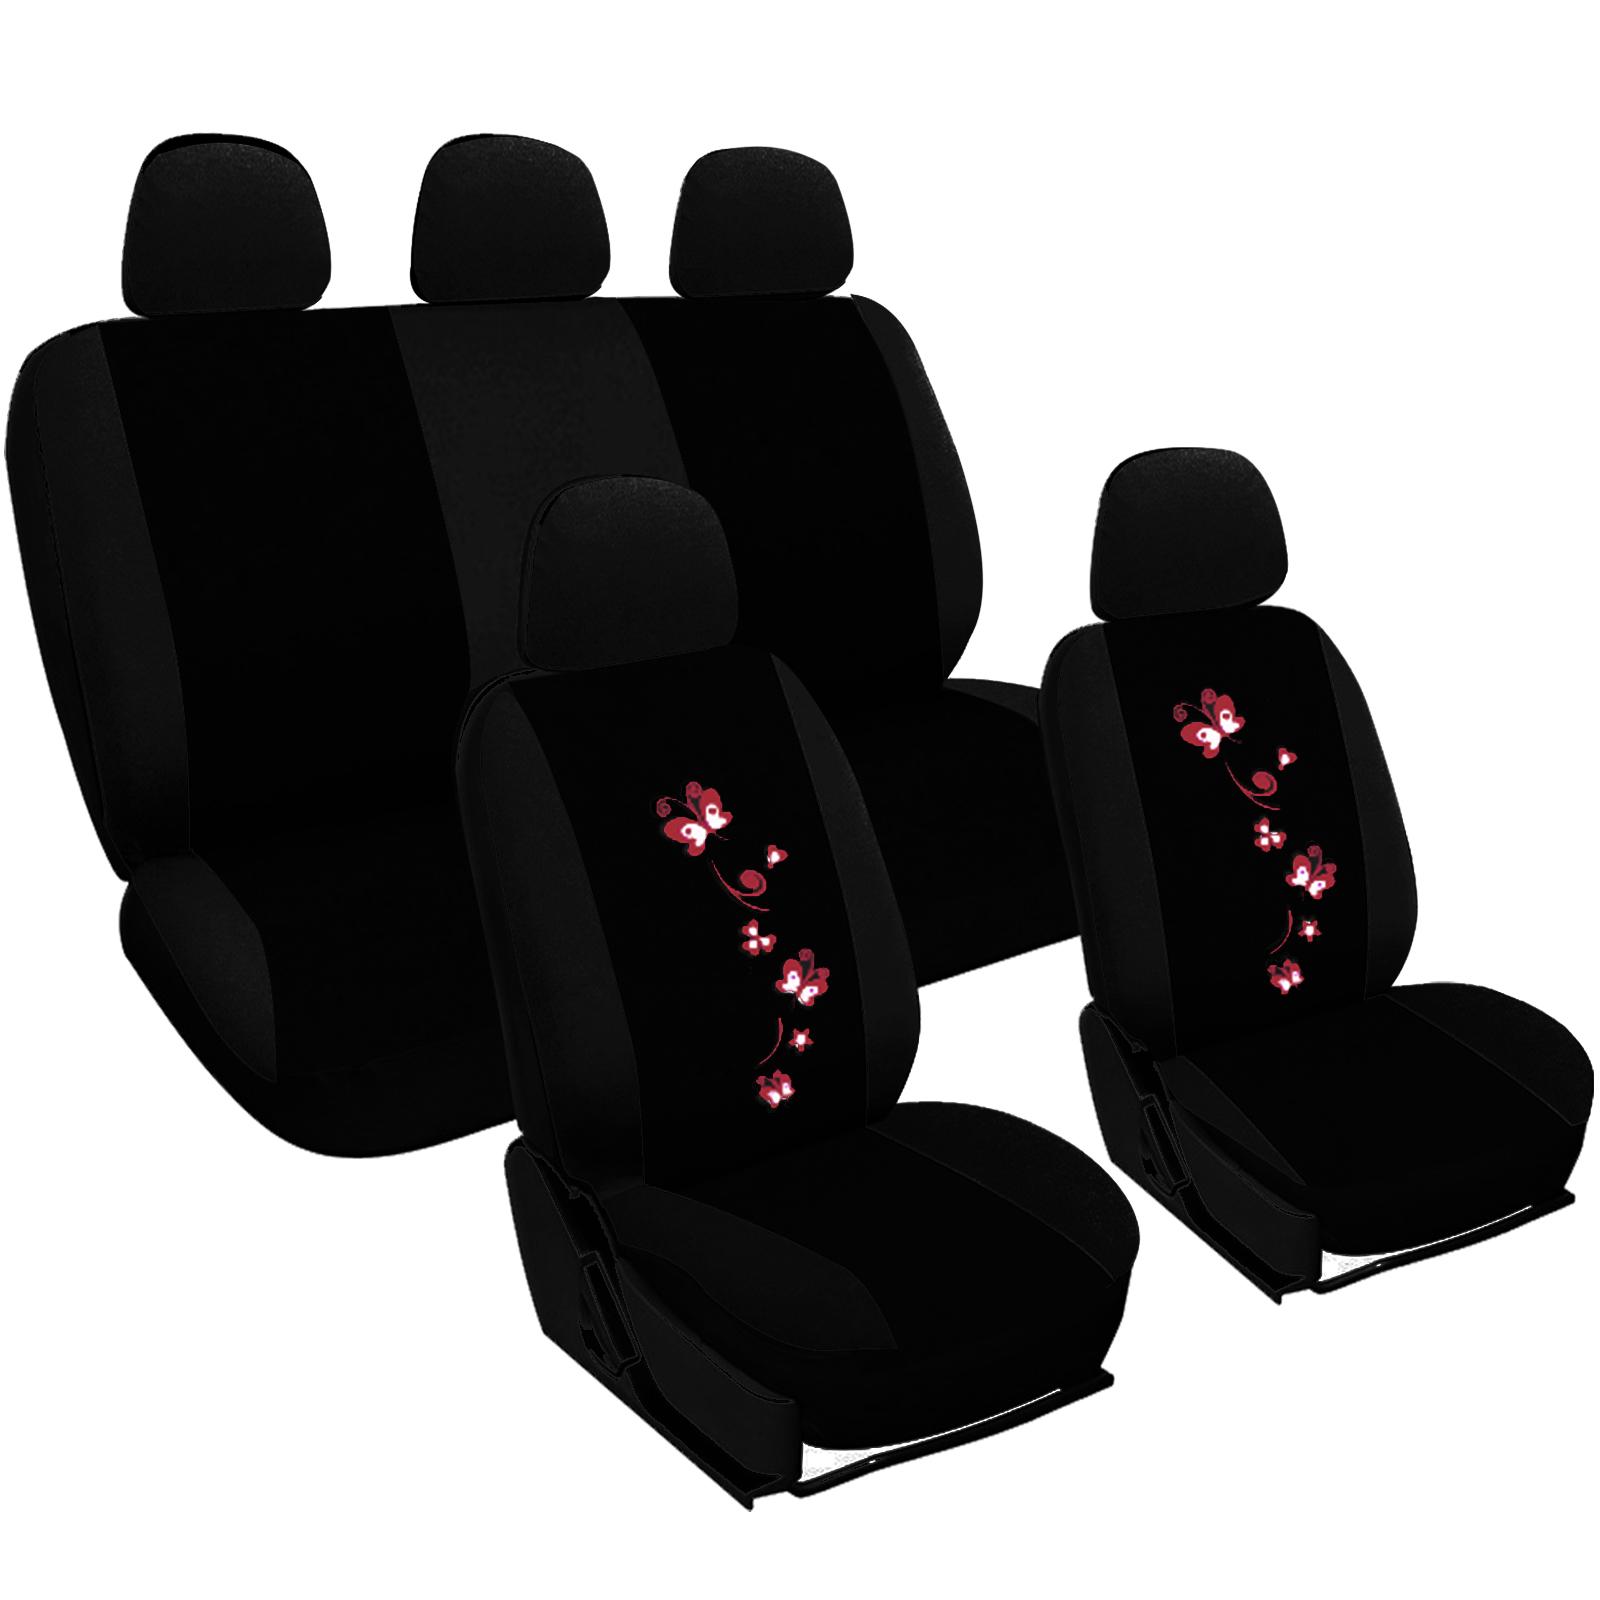 auto sitzbezug sitzbez ge schonbez ge f r autositz ohne. Black Bedroom Furniture Sets. Home Design Ideas